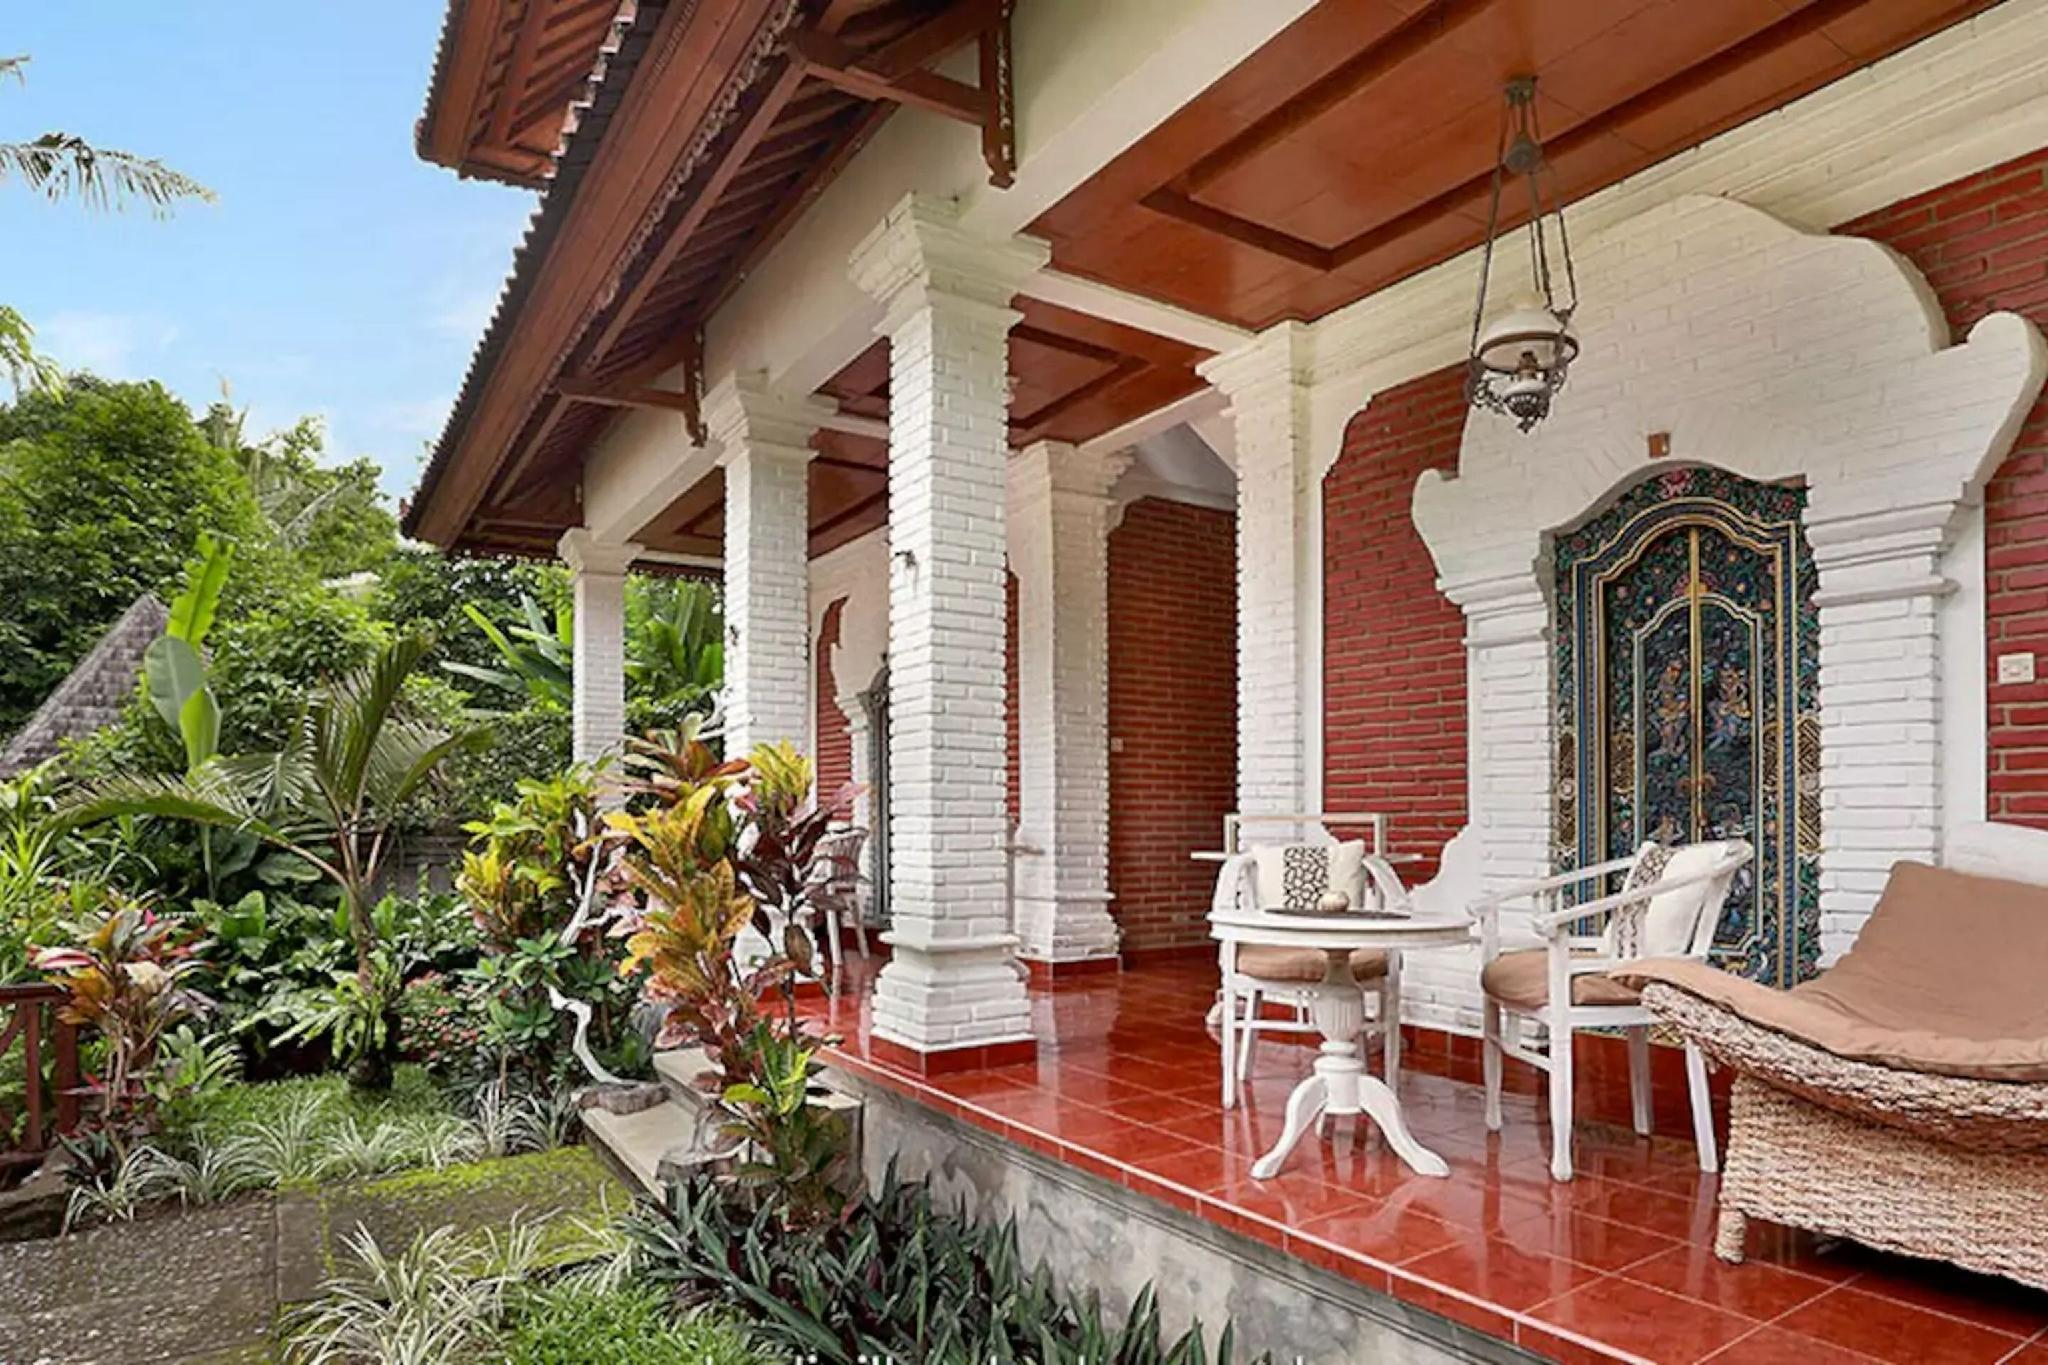 Danaya's Cottage Room 3 With Garden View